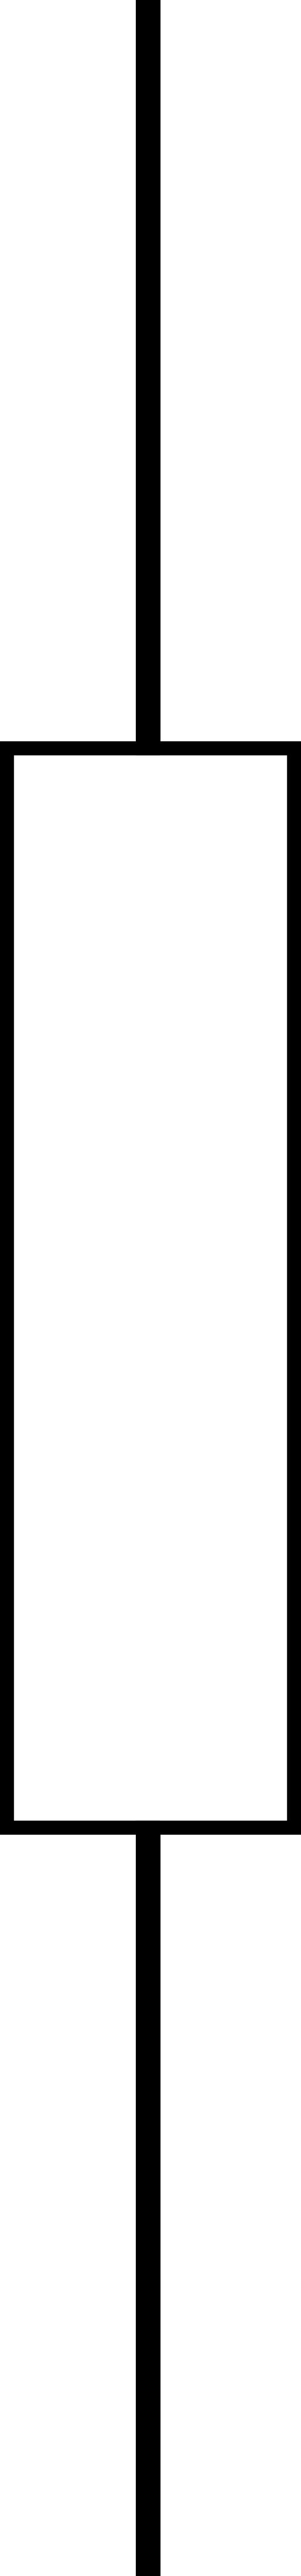 Resistor Clipart.